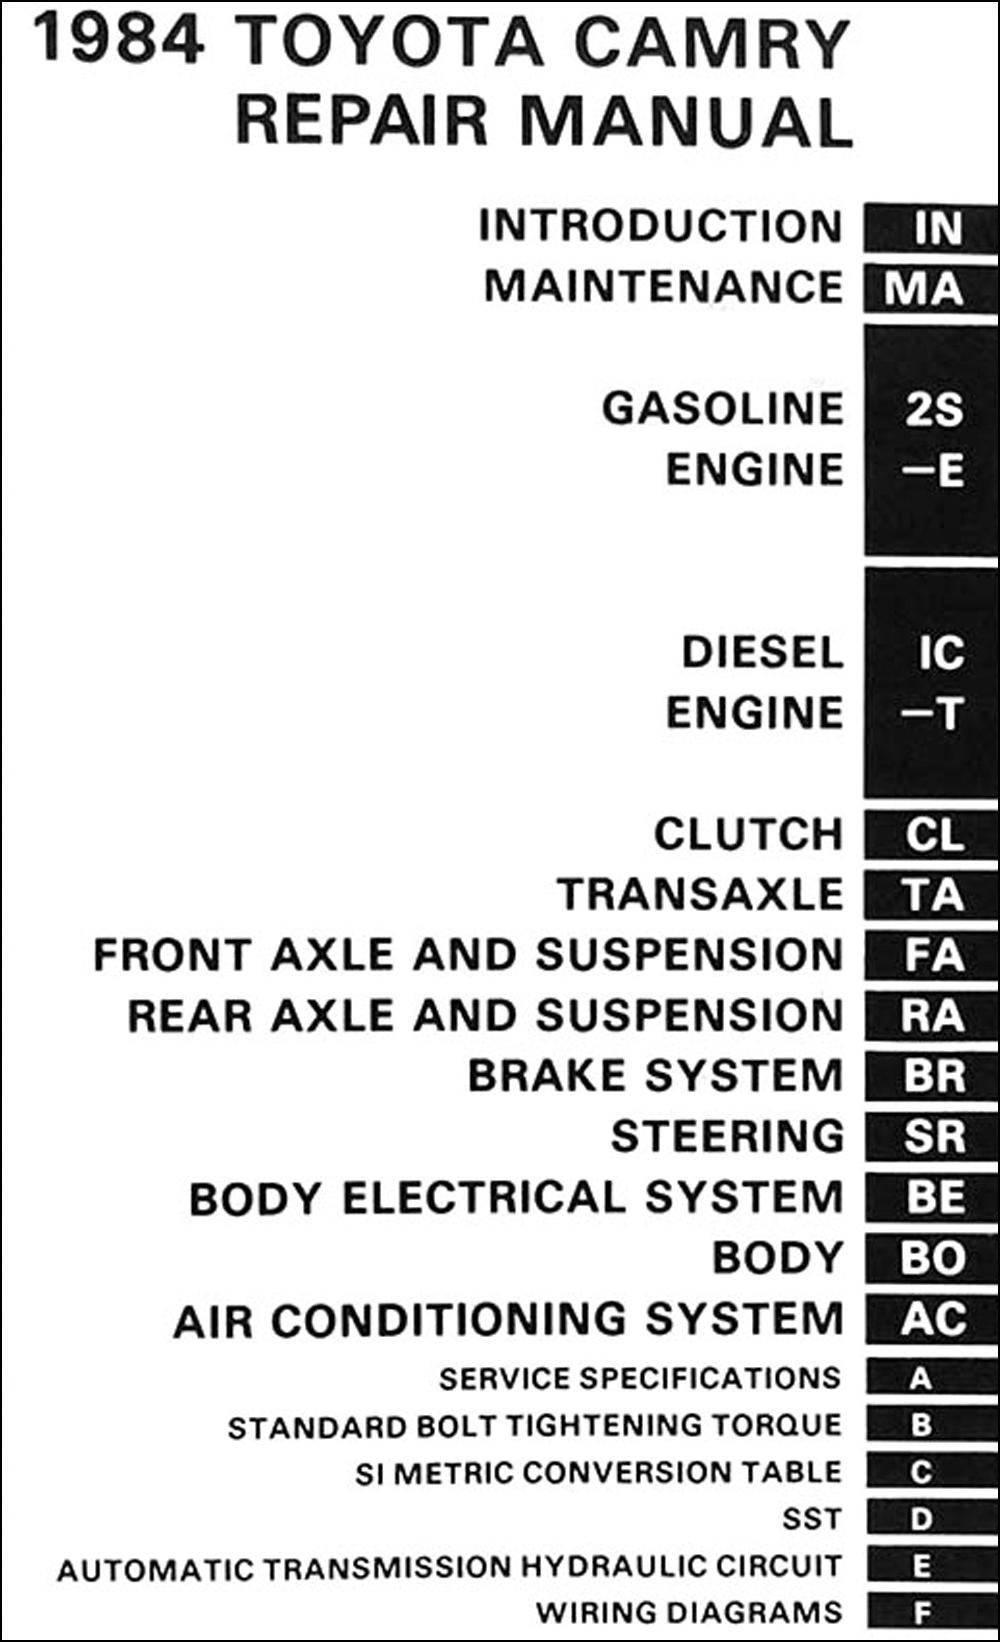 1986 Camry Wiring Diagram System Worksheet And Toyota Electrical Manual Original Hd Walls Find Rh Vagabondtraveller Co 1994